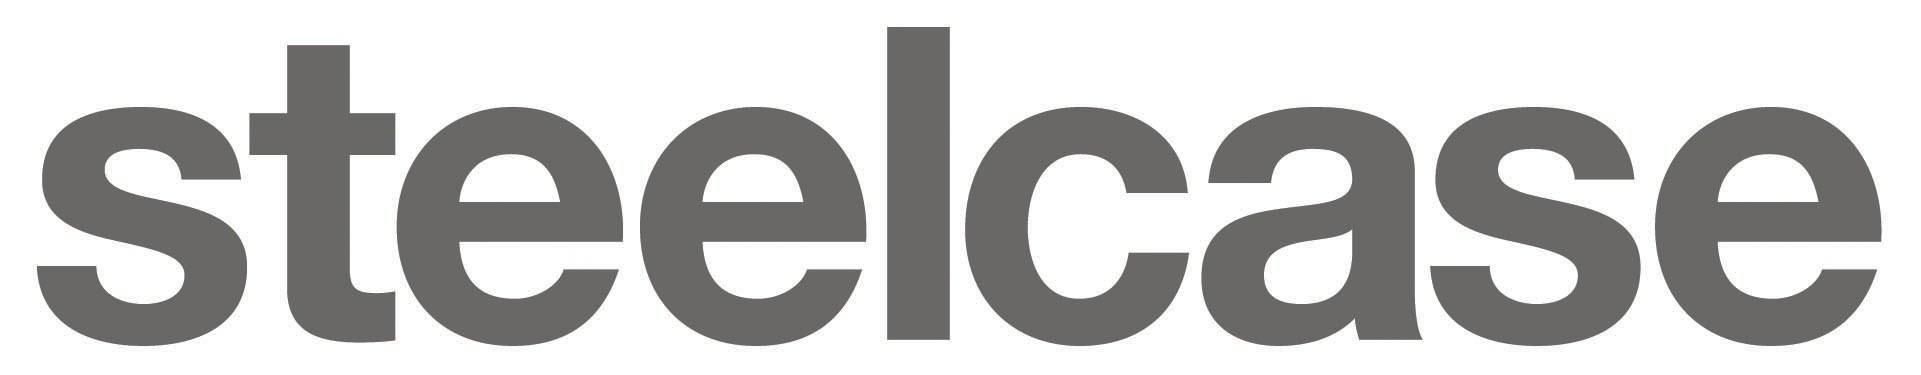 Steelcase-Logo.jpg